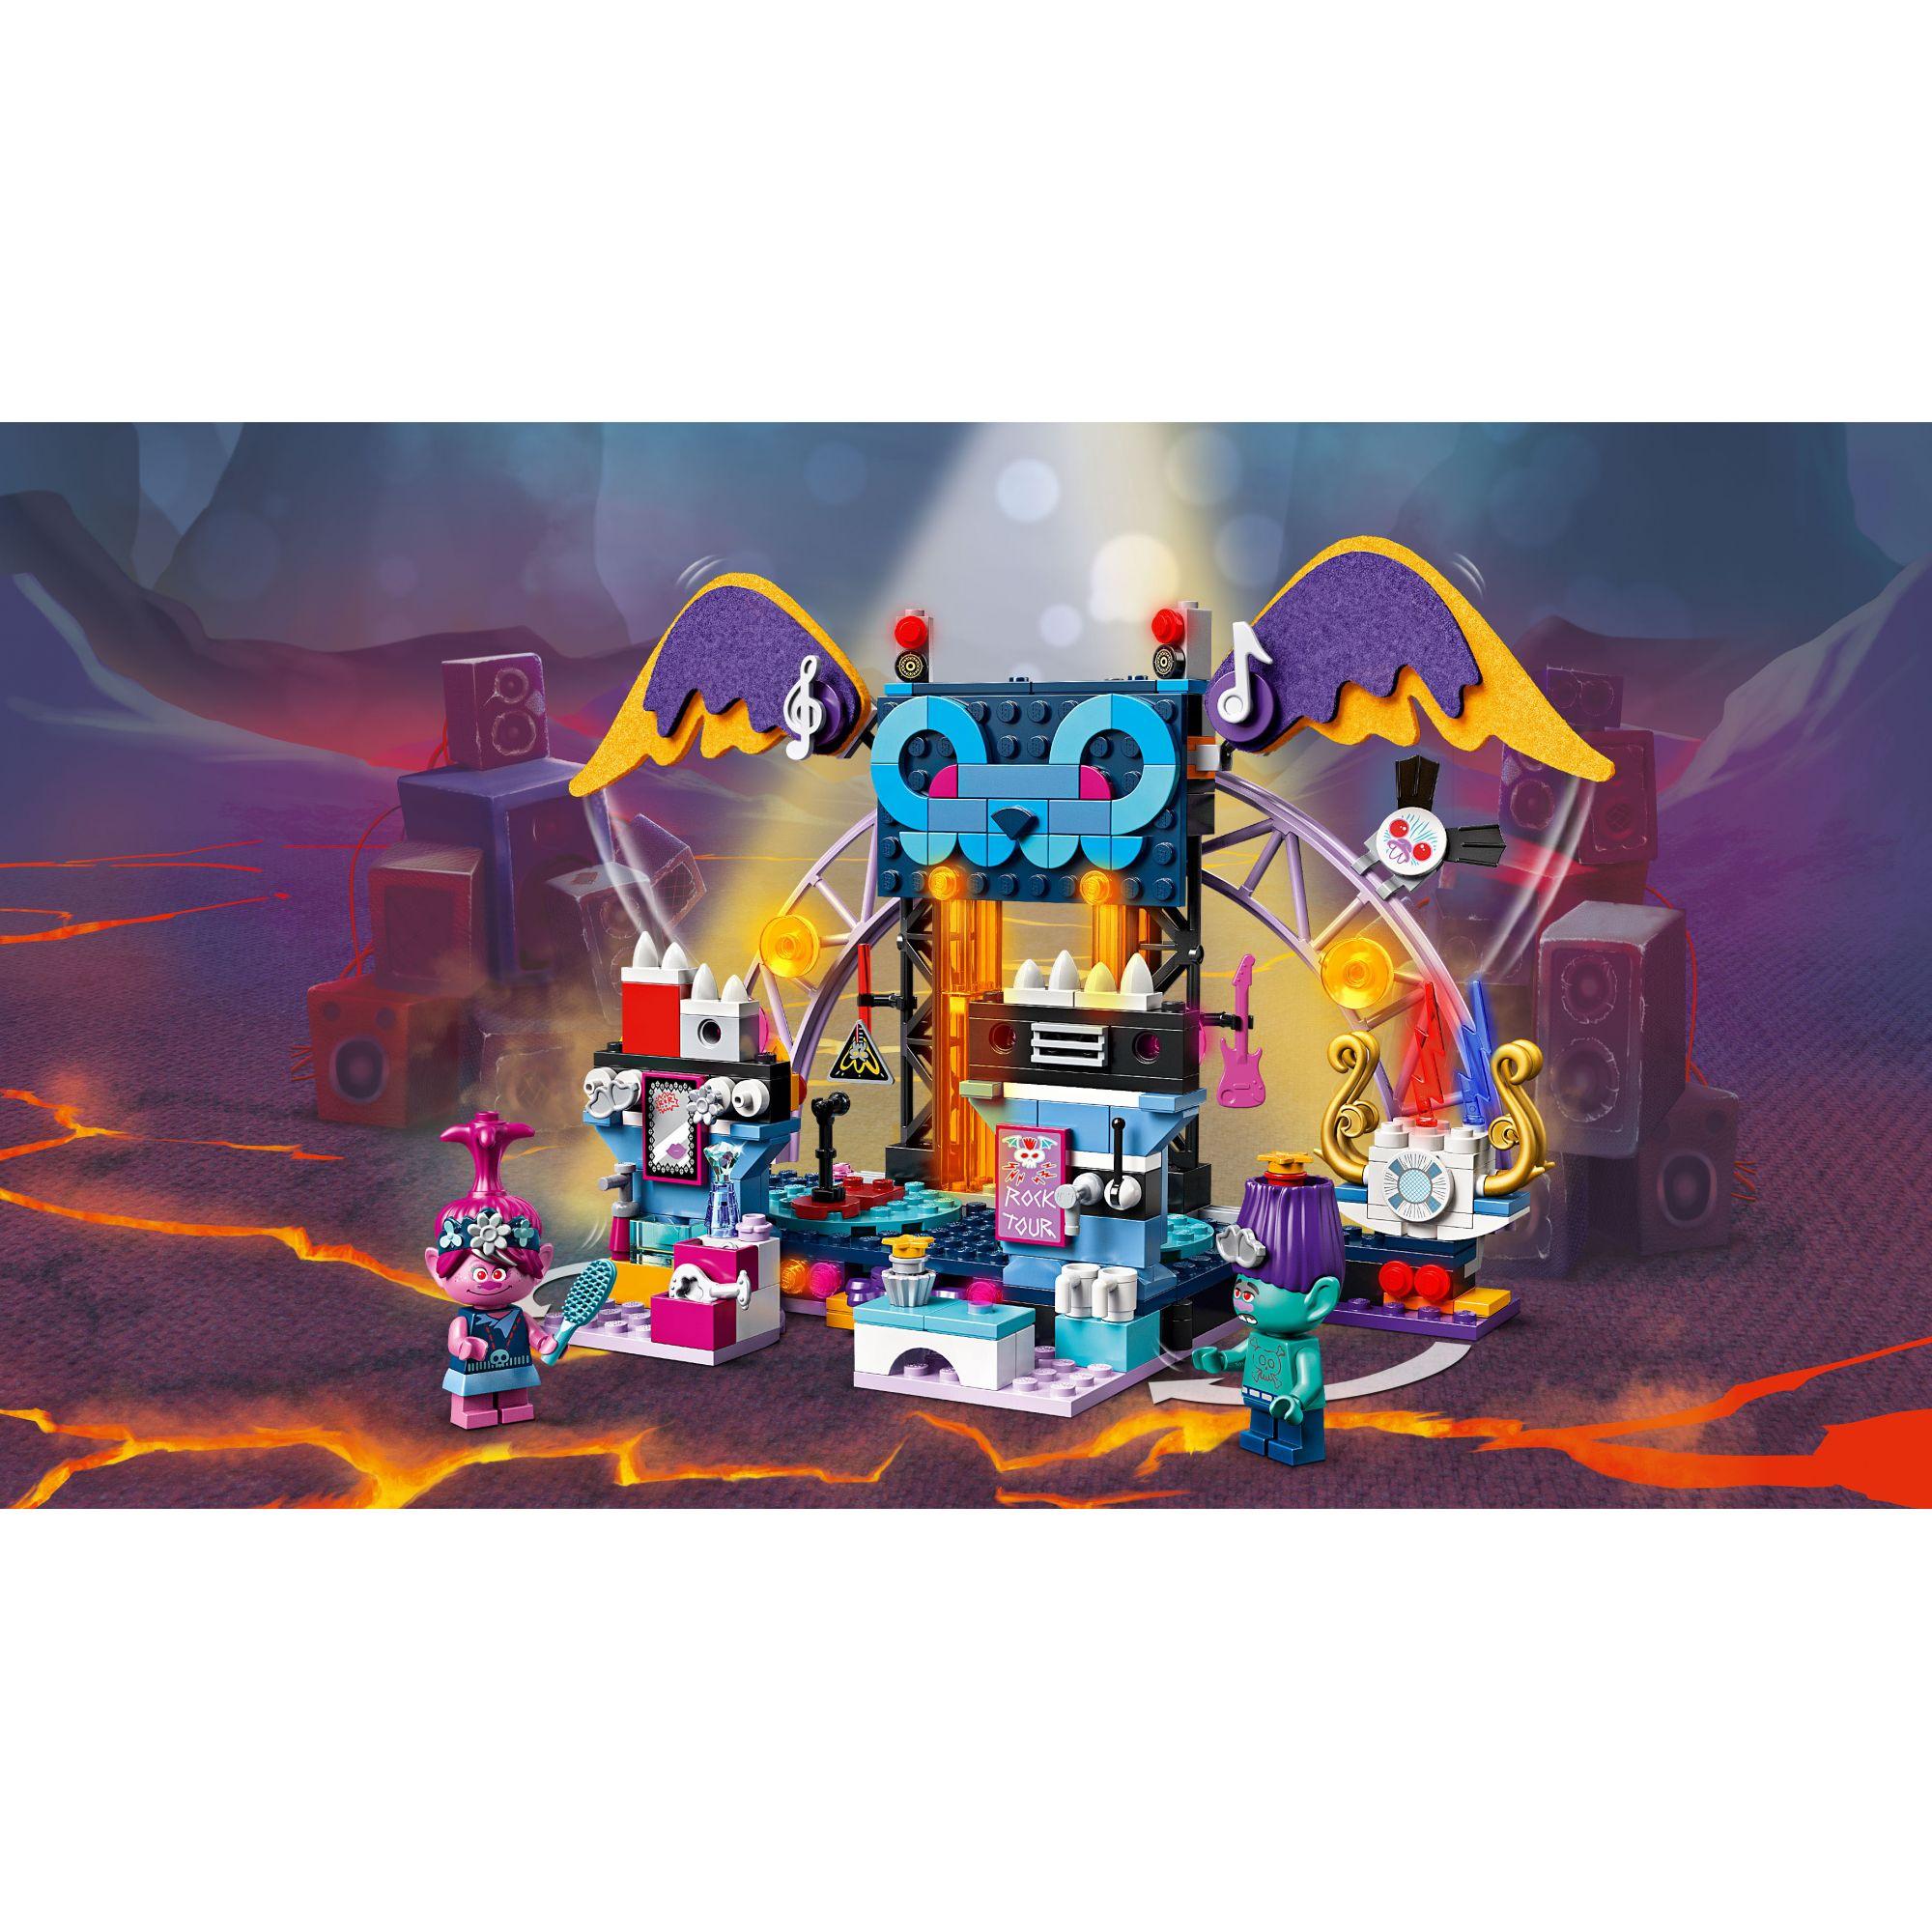 LEGO Trolls Concerto a Vulcano Rock City - 41254